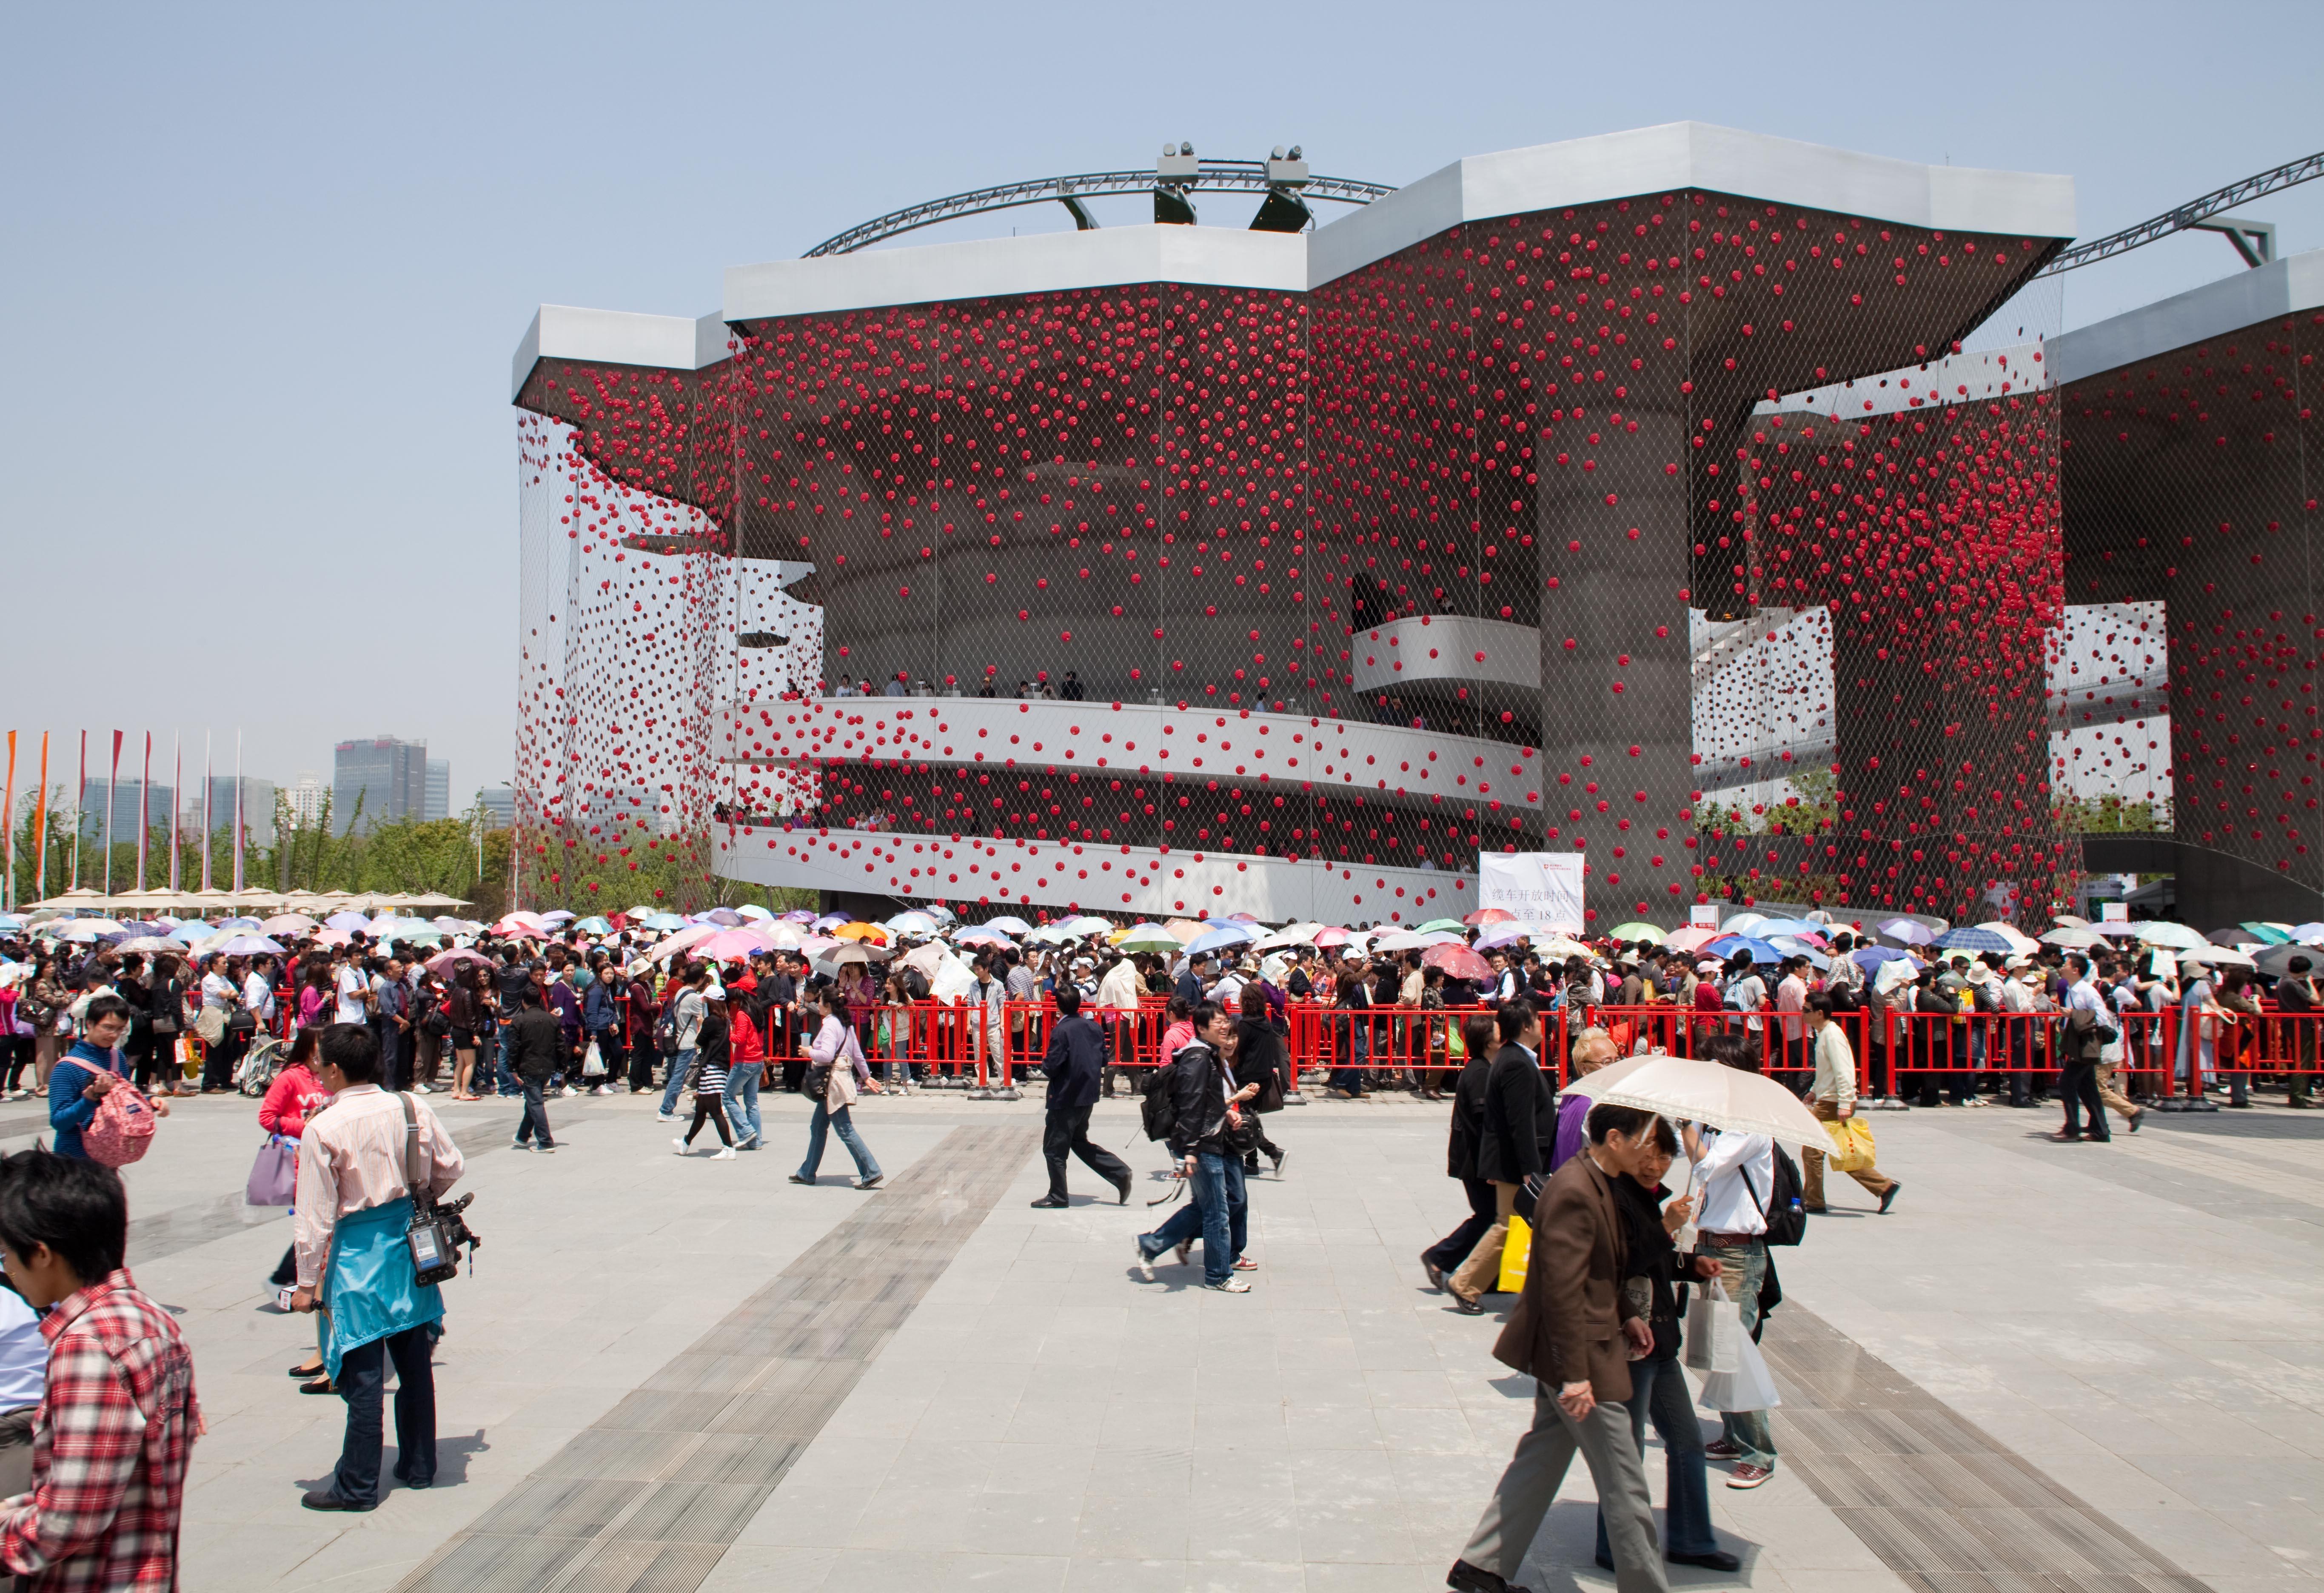 File:Swiss Pavilion Expo 2010 Shanghai opening day.jpg - Wikimedia ...